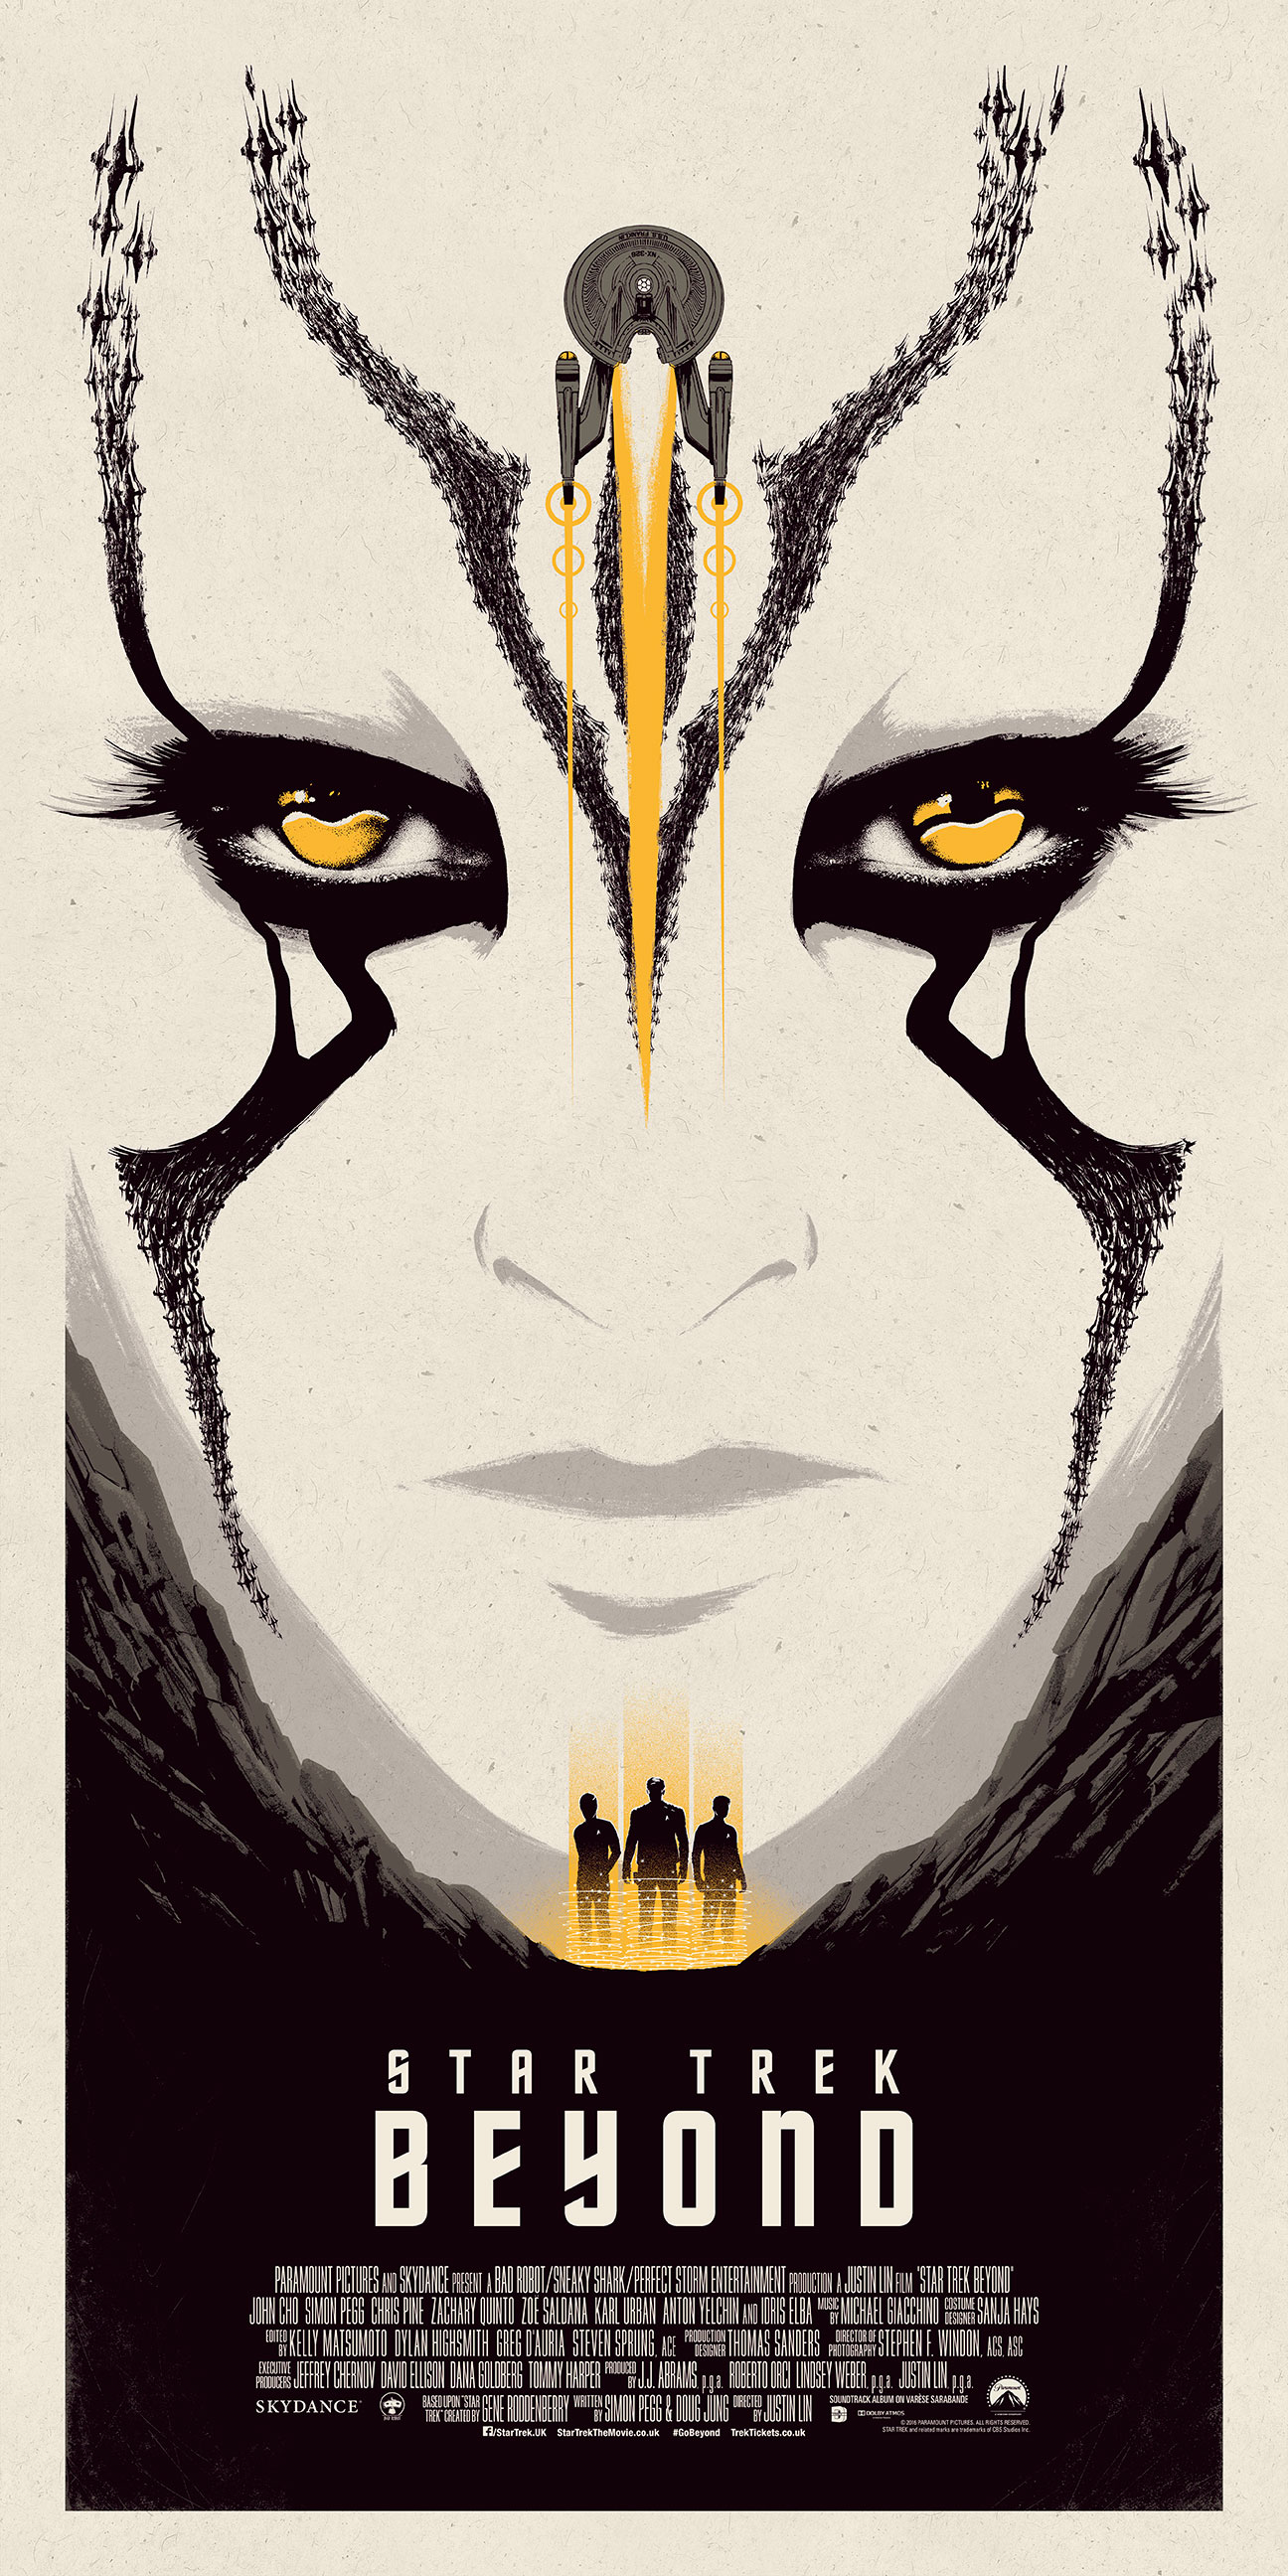 Star Trek Beyond – Yellow poster